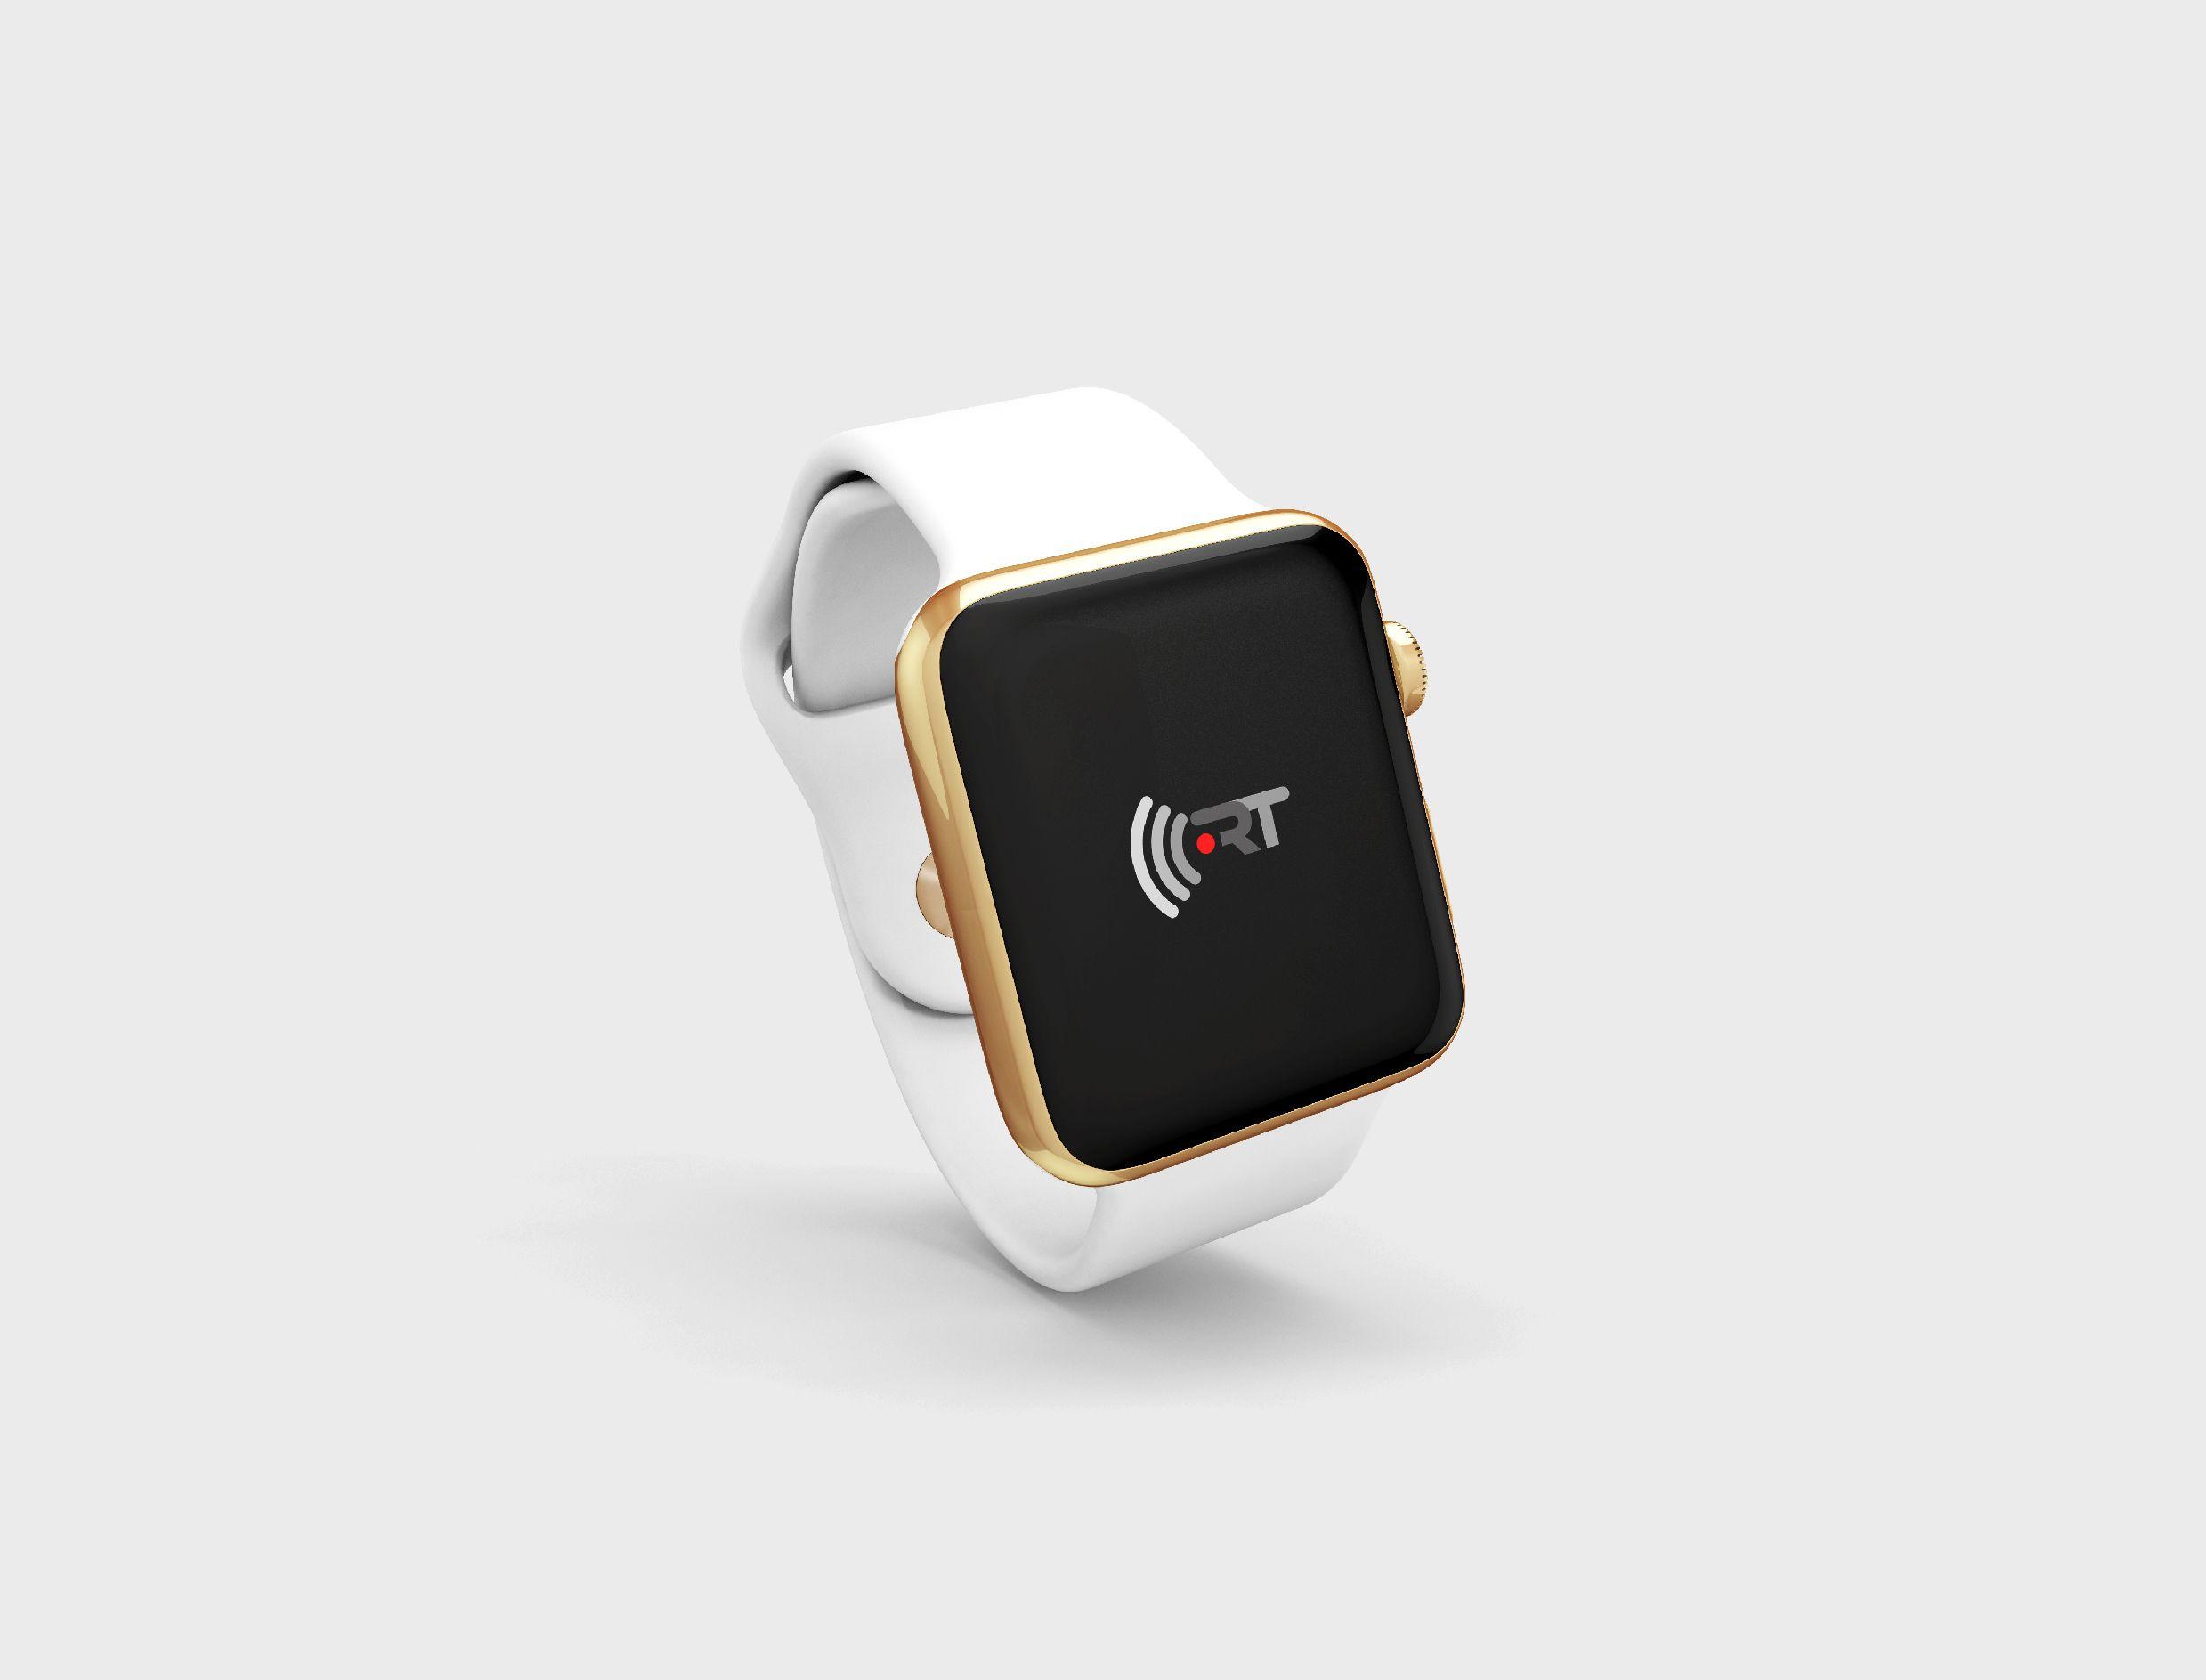 rt-smart_mockup-10